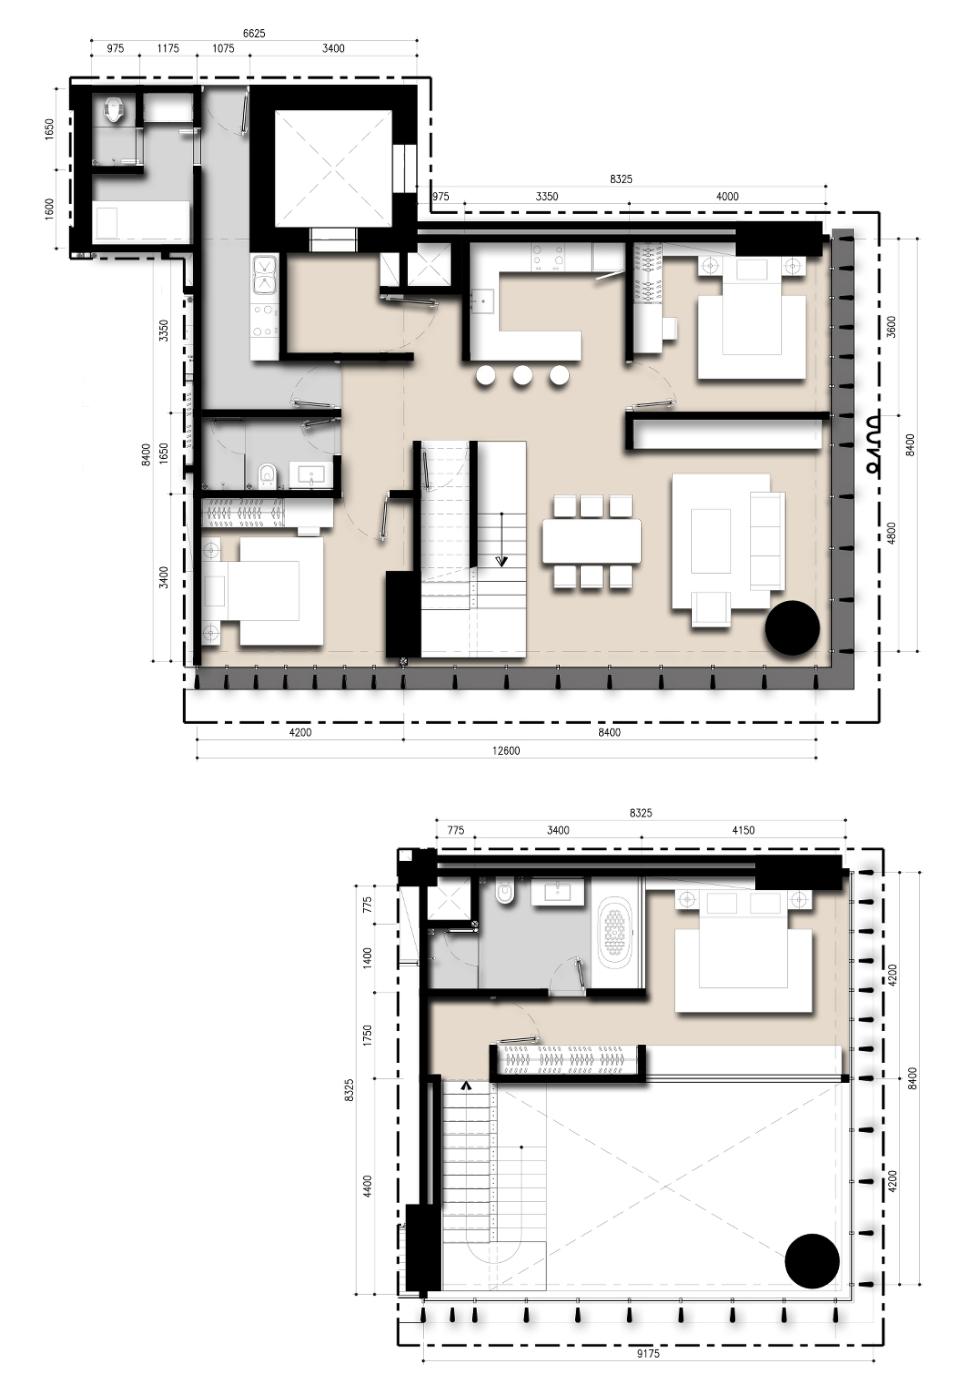 Saumata unit Plan 3 BR Loft A